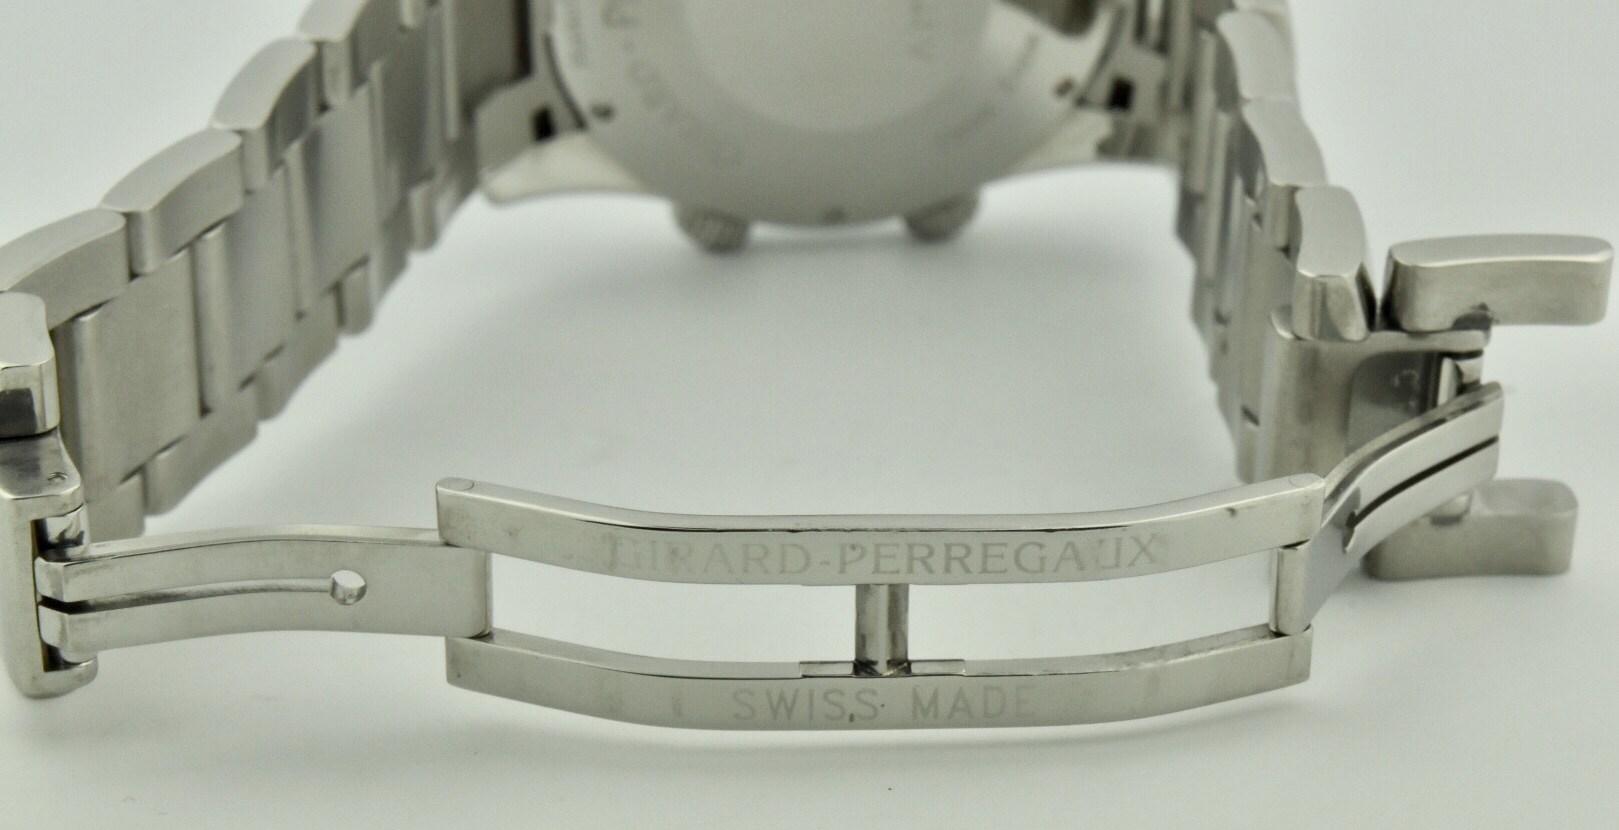 IMG 7693 - Girard-Perregaux Traveller II